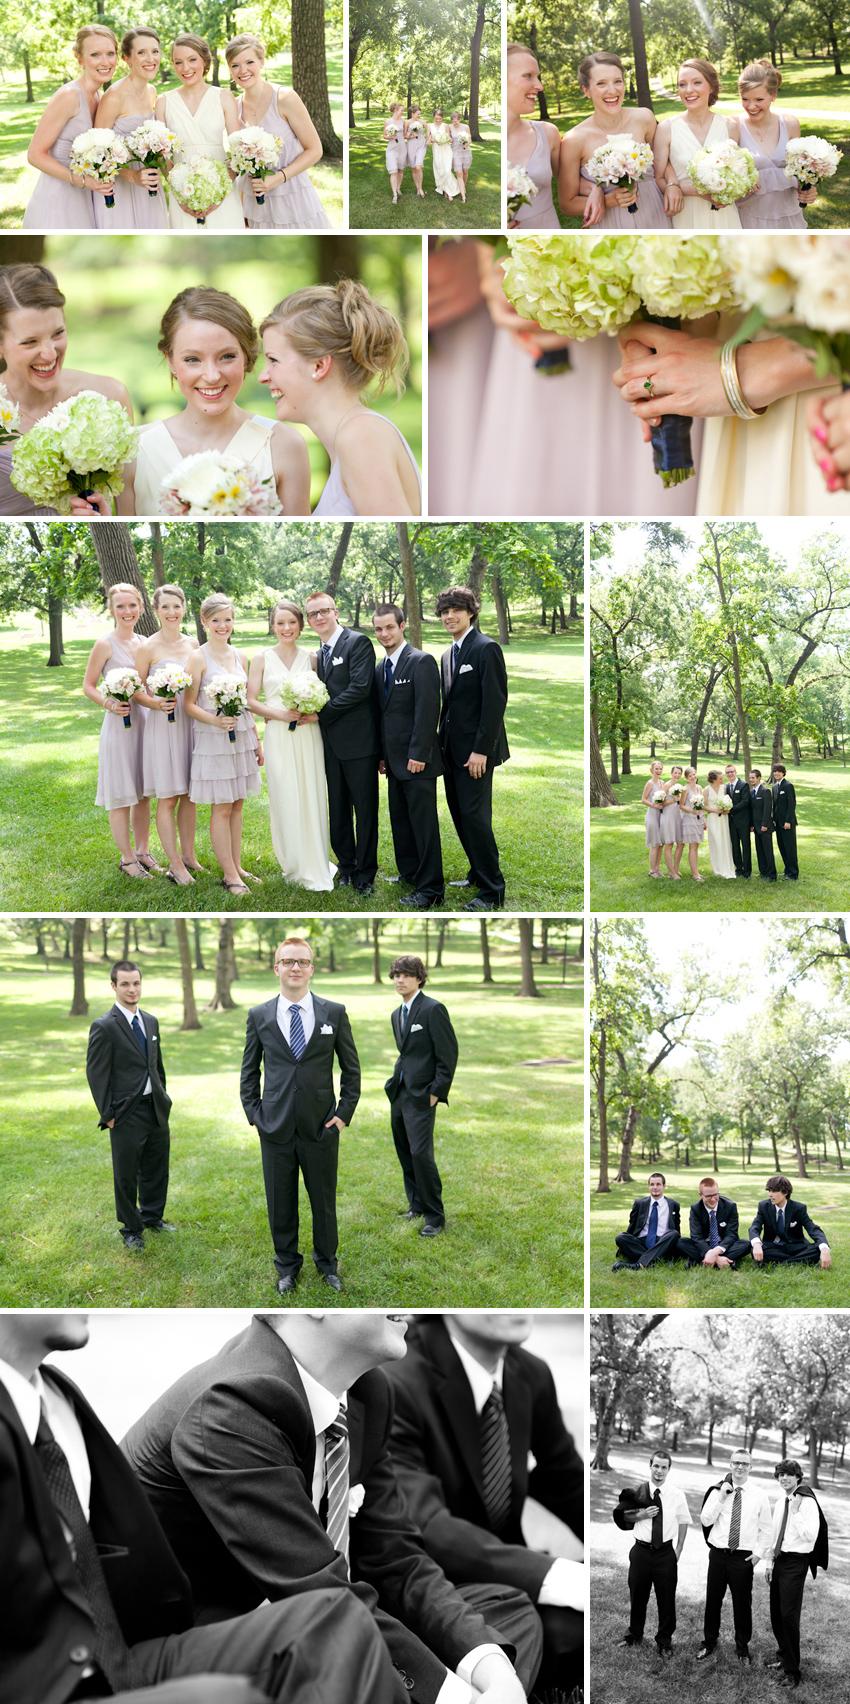 Kansas City/Lawrence wedding photographer Darbi G. Photography